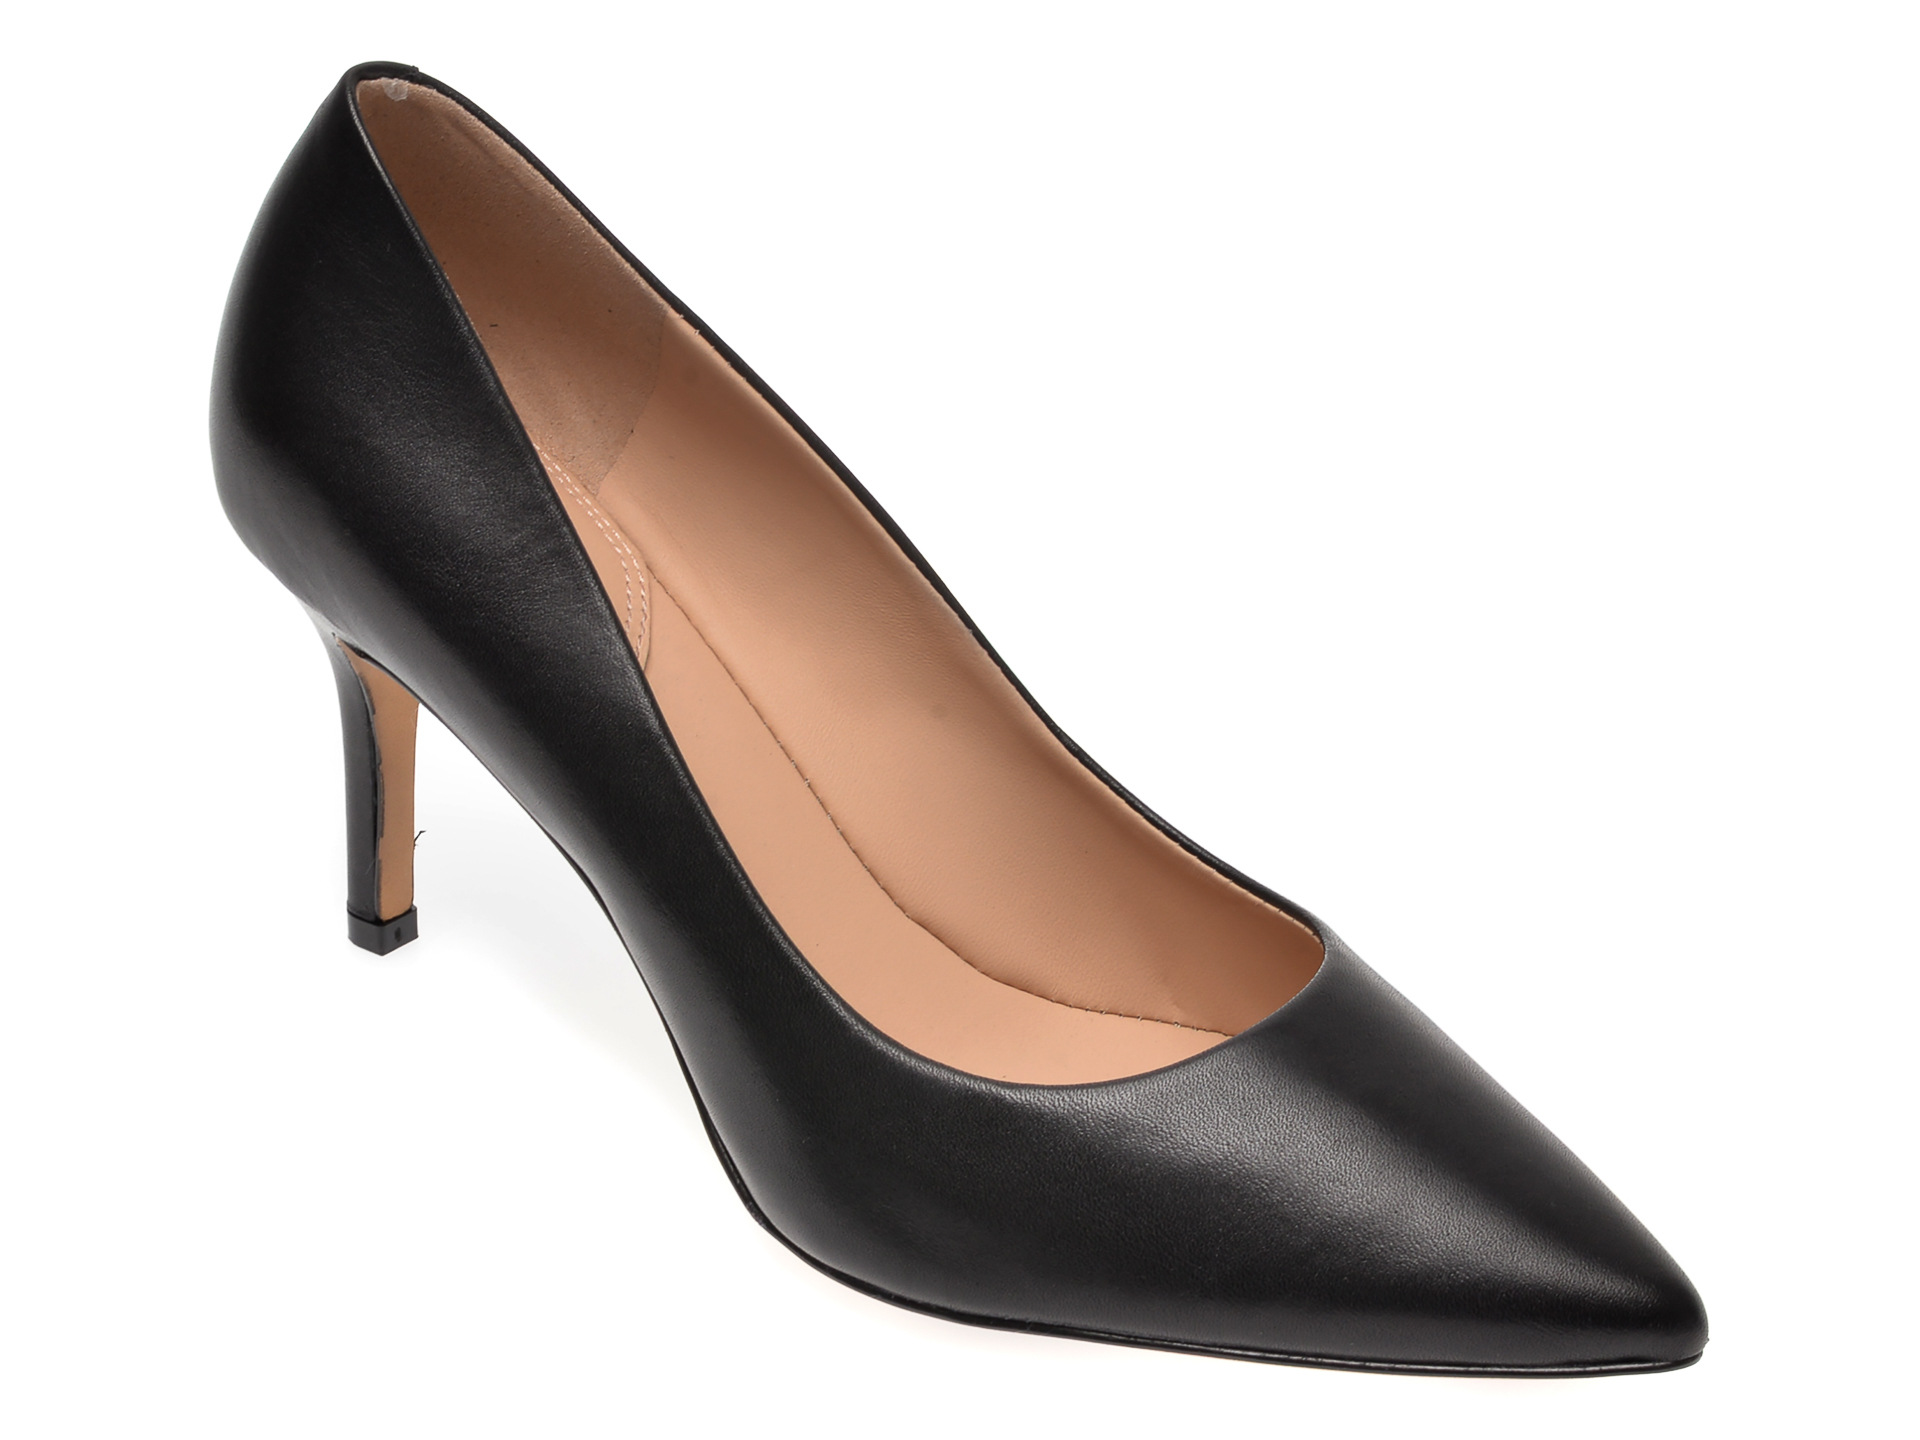 Pantofi Aldo Negri, Coronitiflex001, Din Piele Naturala